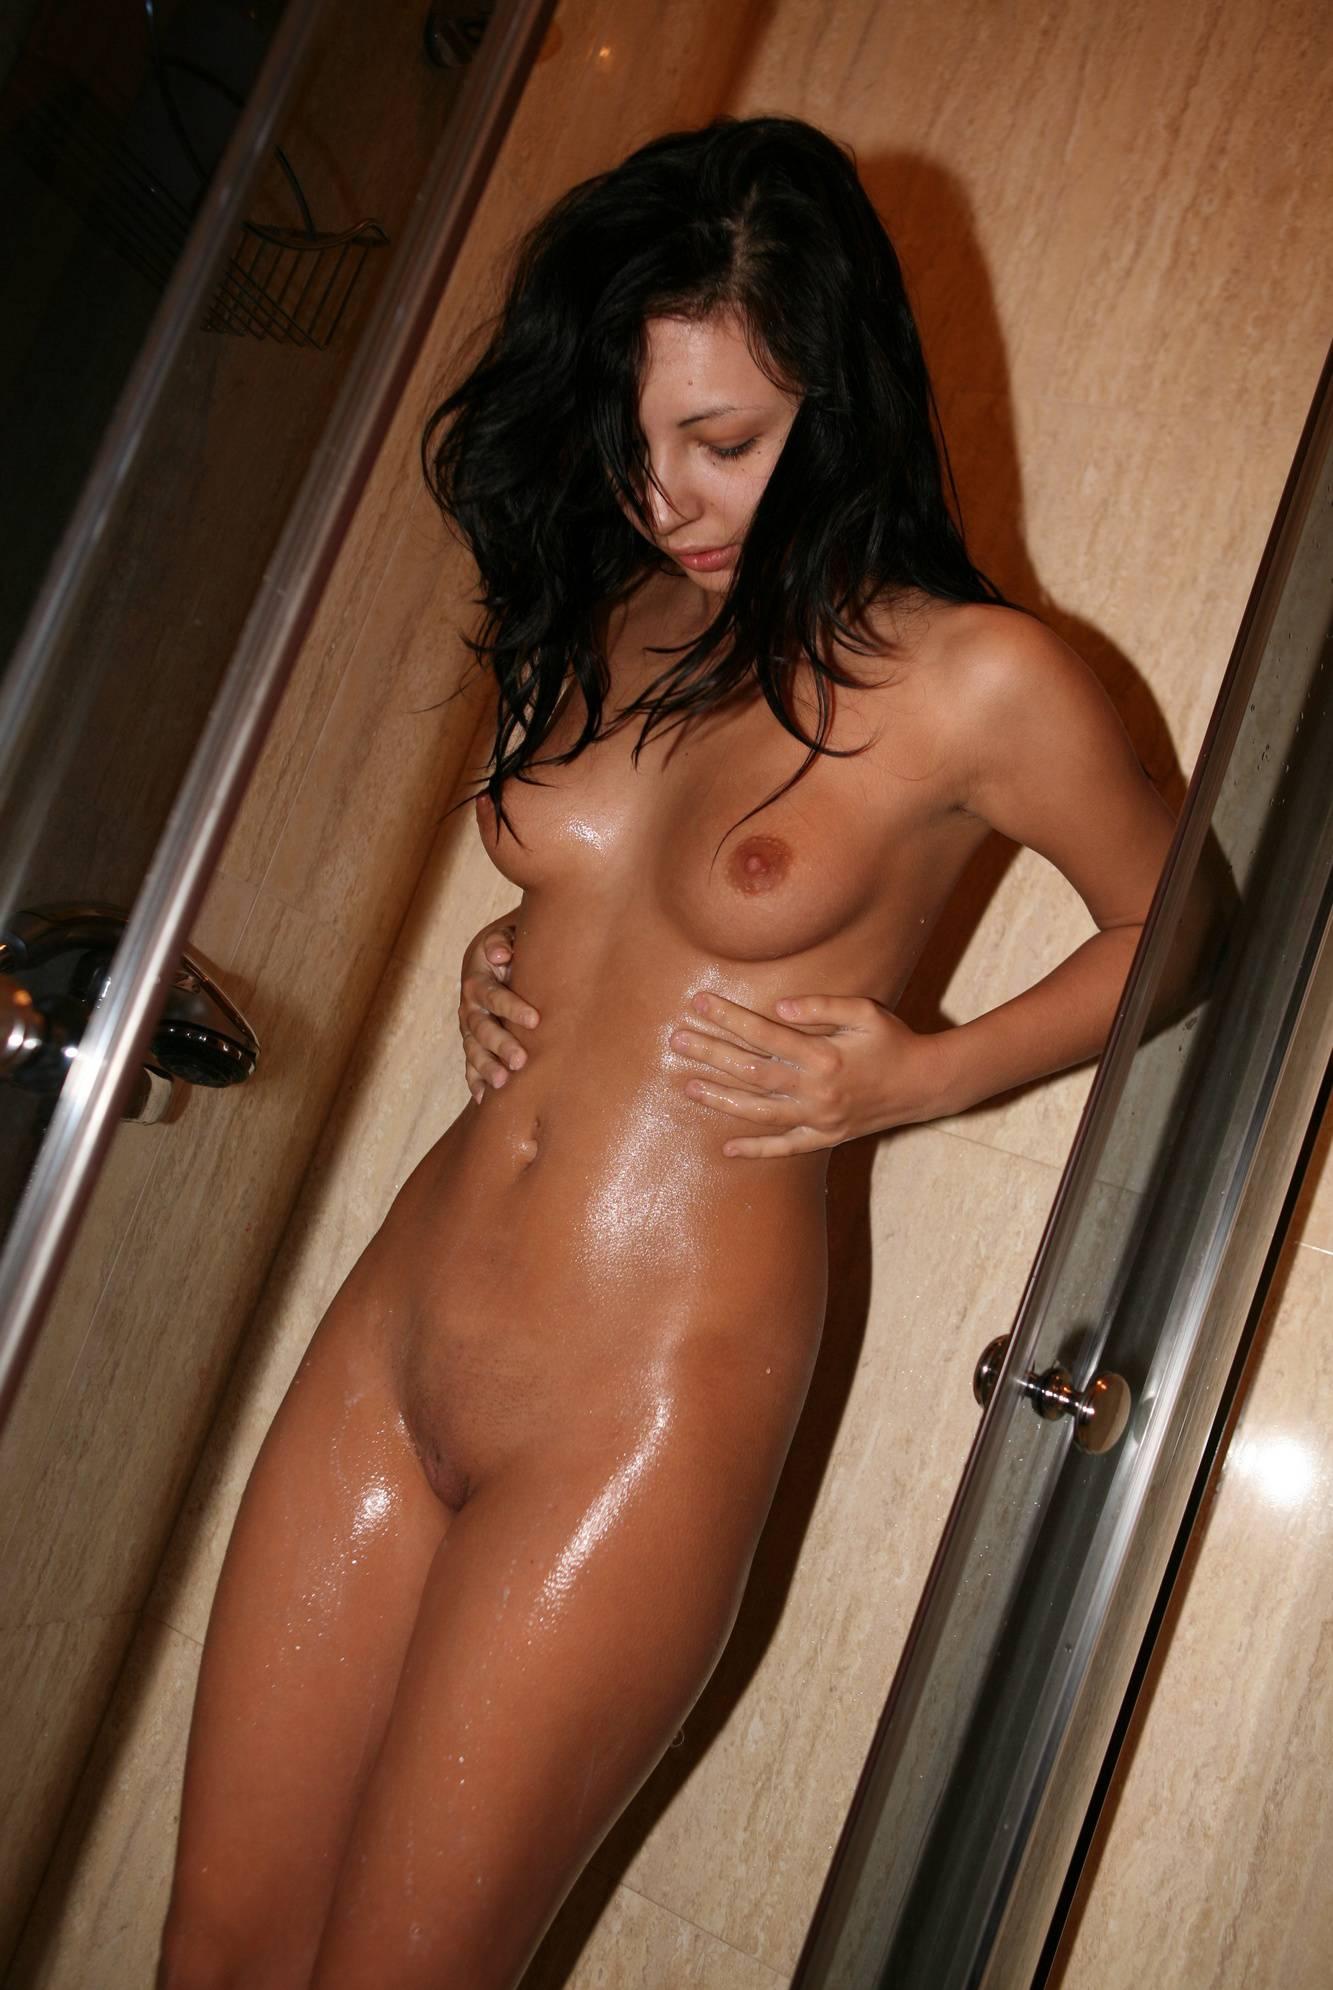 Purenudism Photos Summer Shower Pleasure - 1